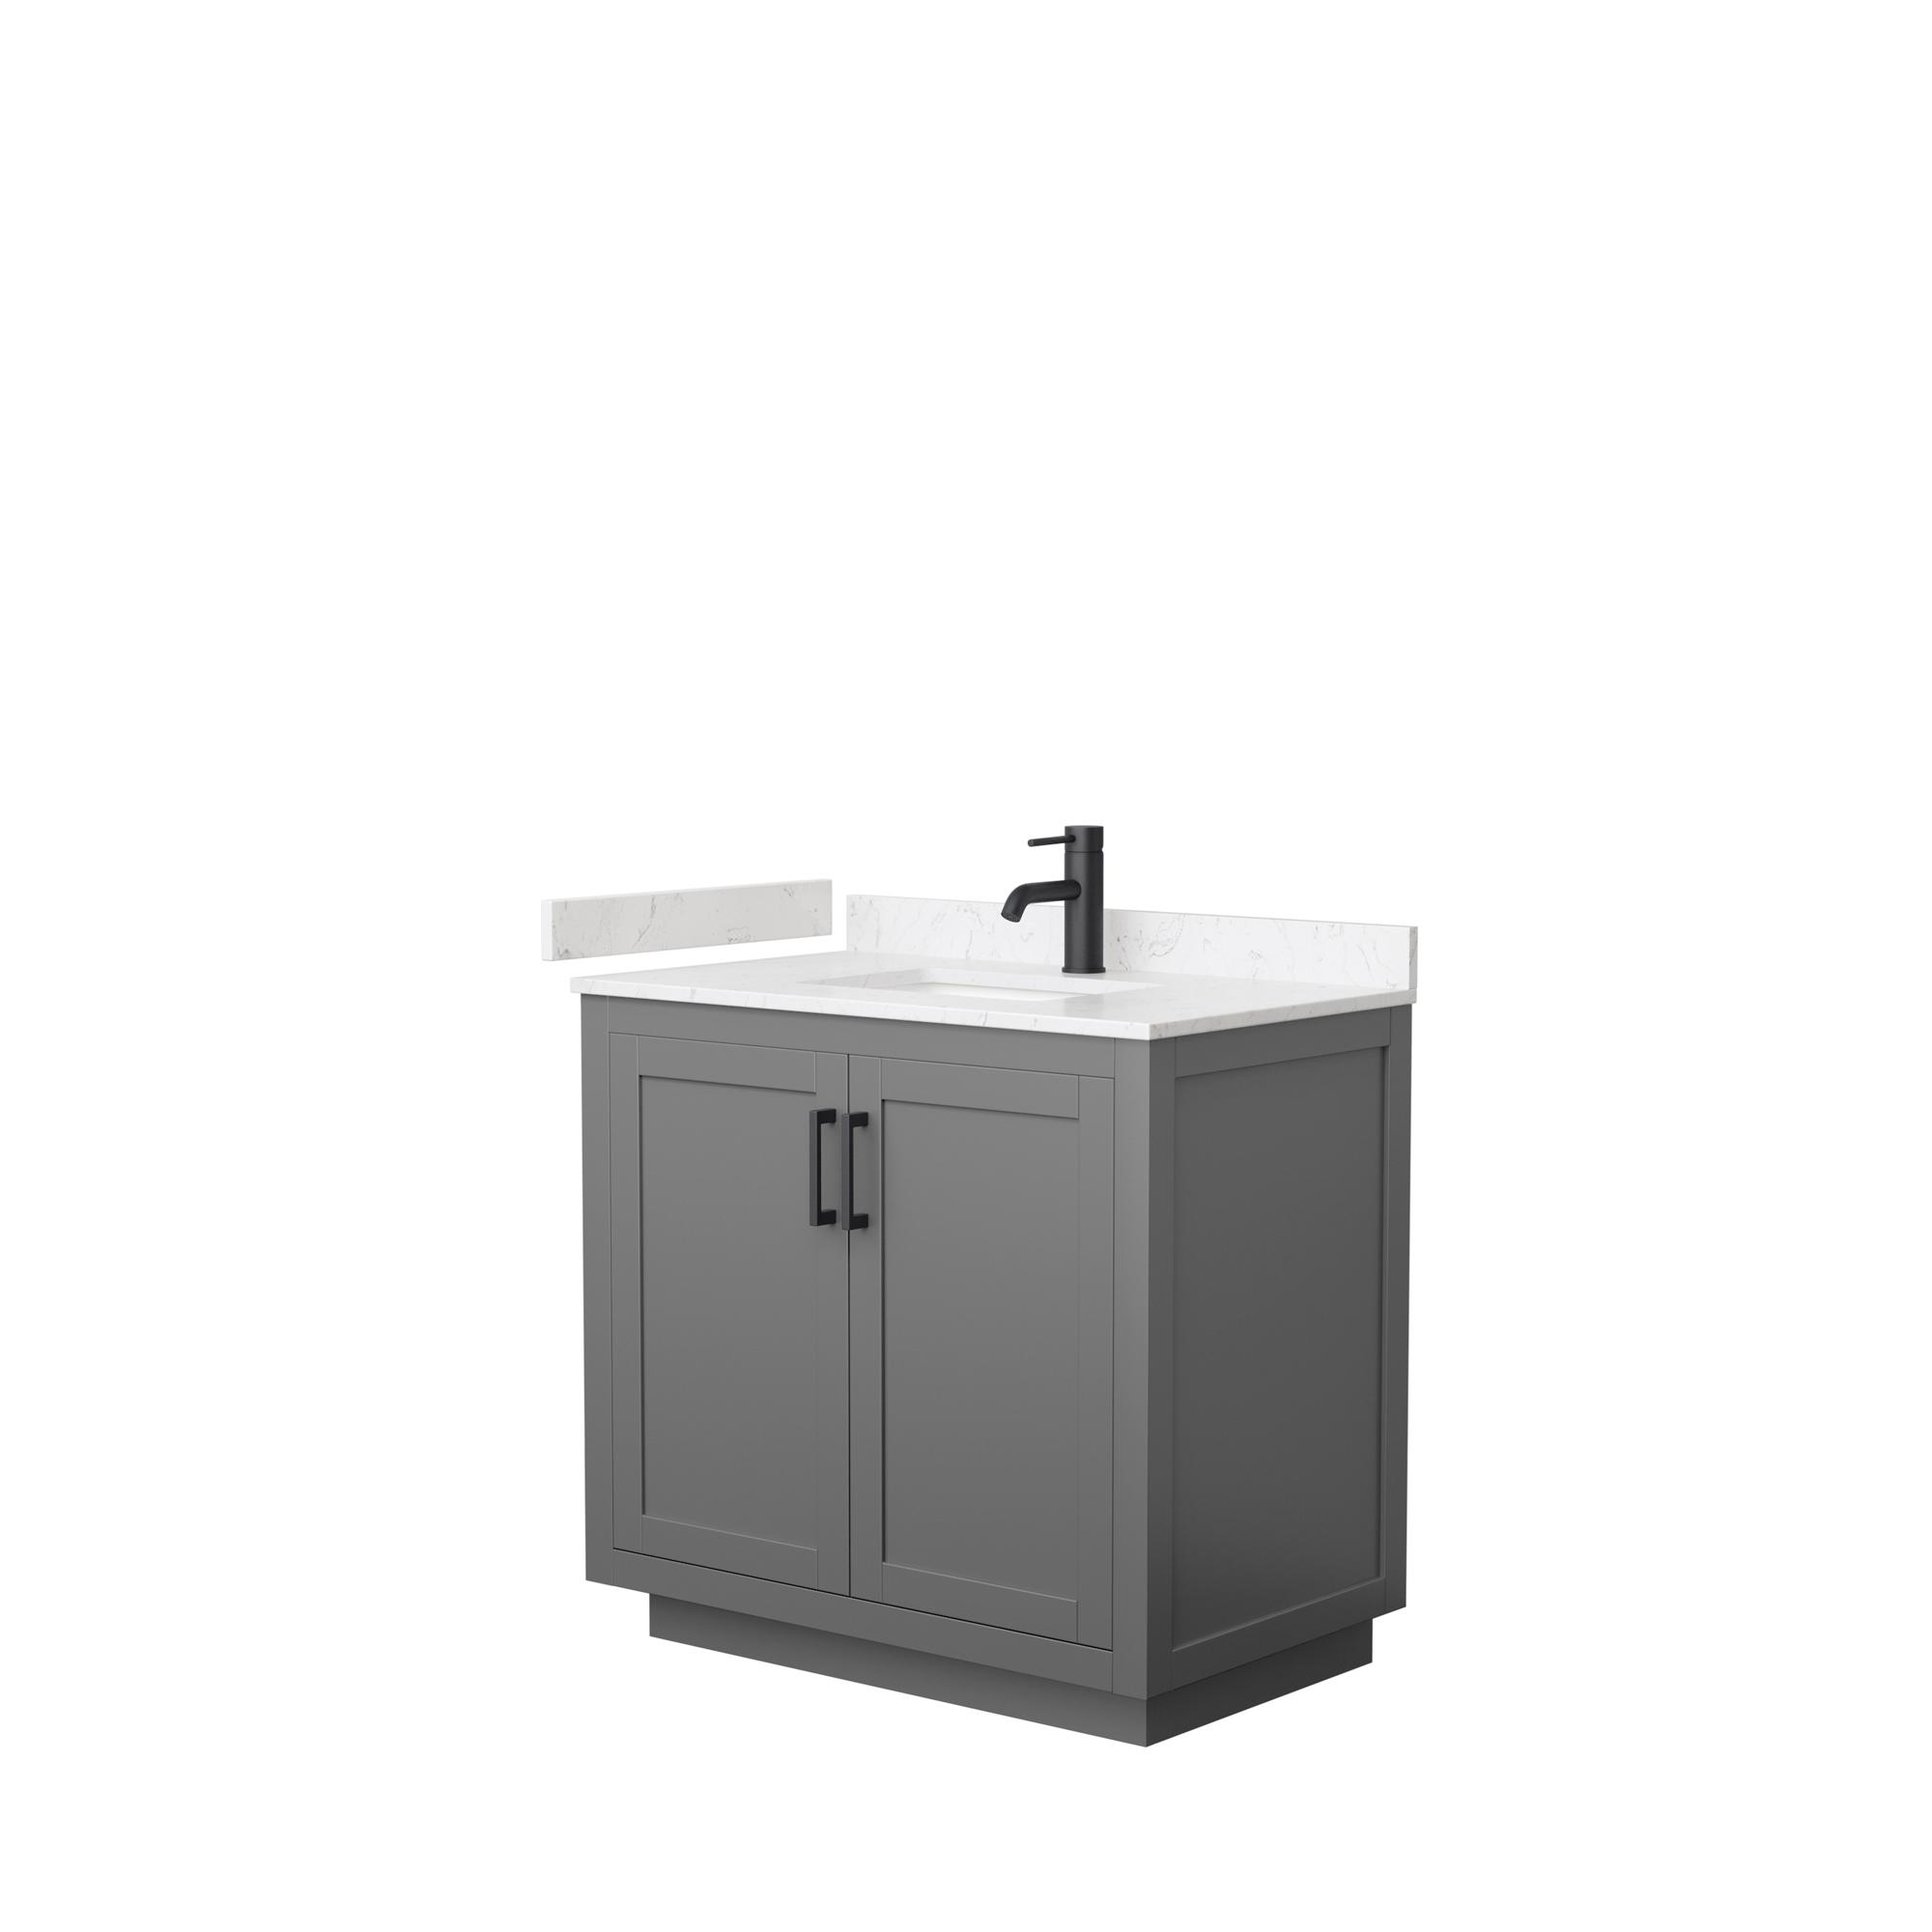 "36"" Single Bathroom Vanity in Dark Gray, Light-Vein Carrara Cultured Marble Countertop, Undermount Square Sink, Matte Black Trim"